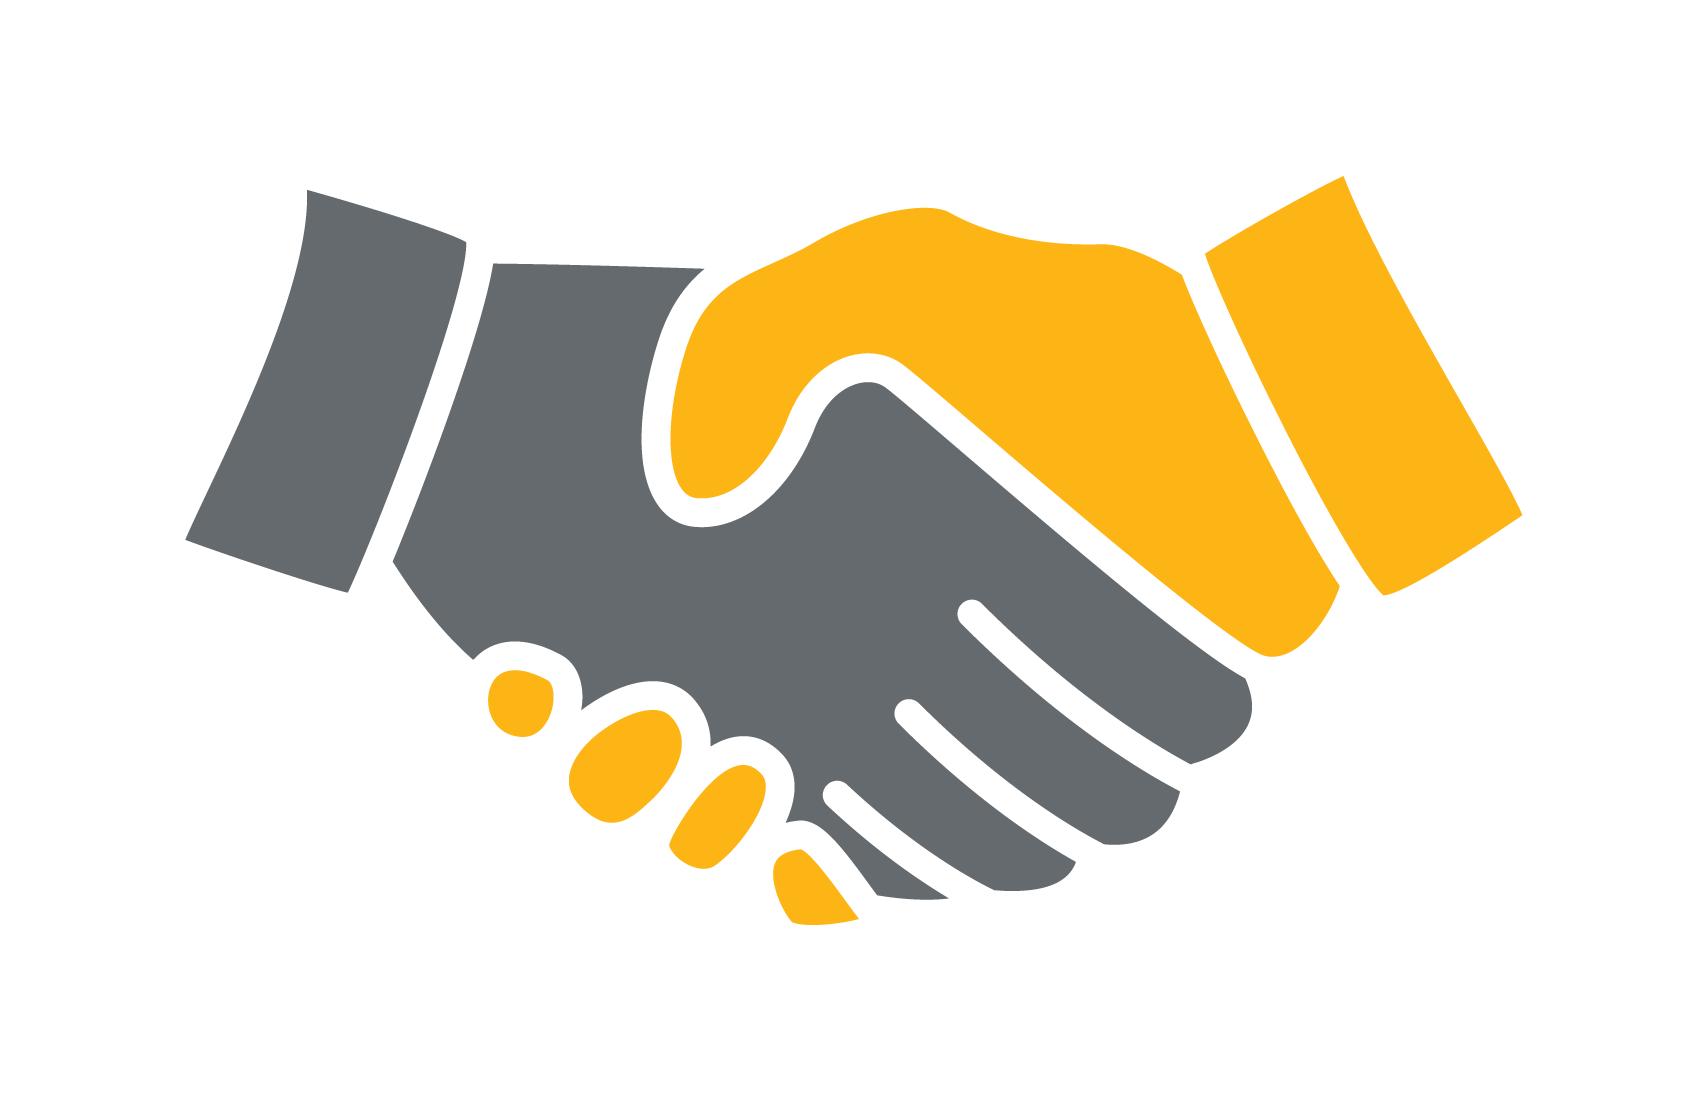 The Pole Base business partnership